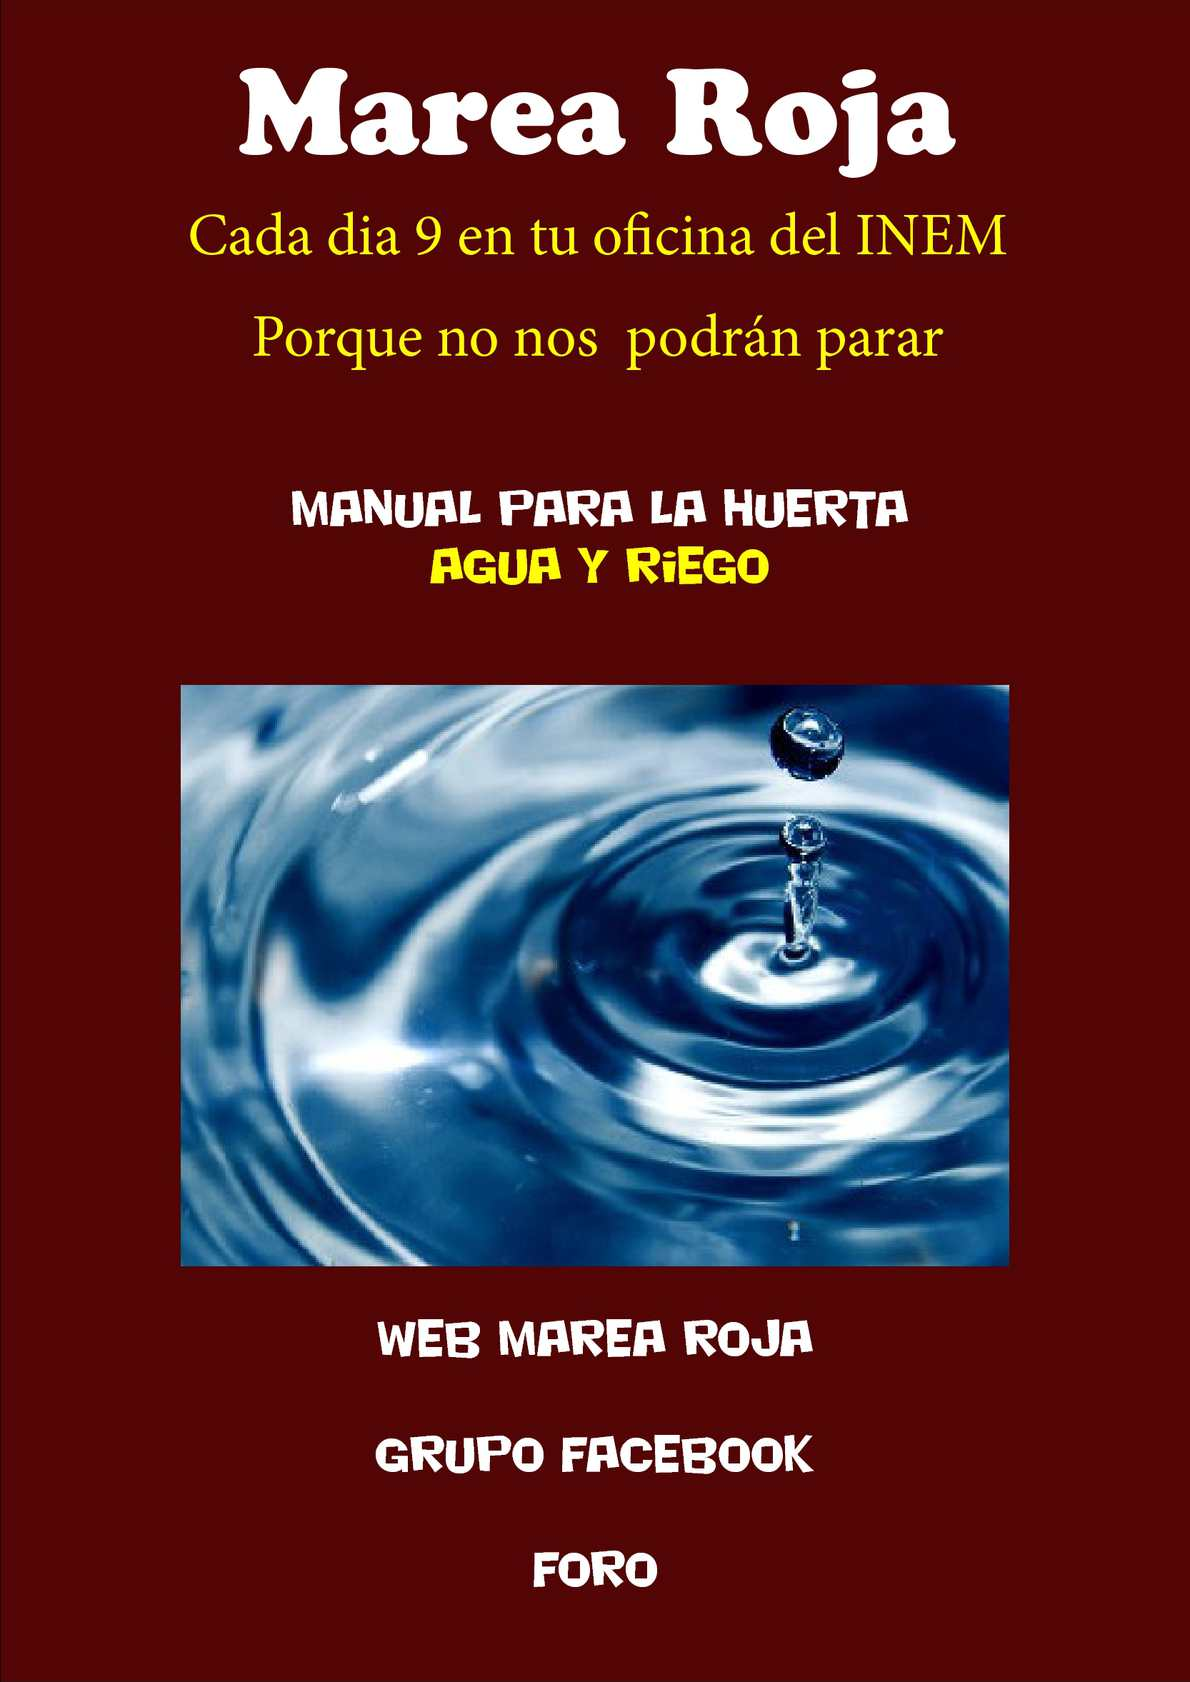 Calam o manual sobre la huerta org nica agua y riego for Oficina inem santa eugenia